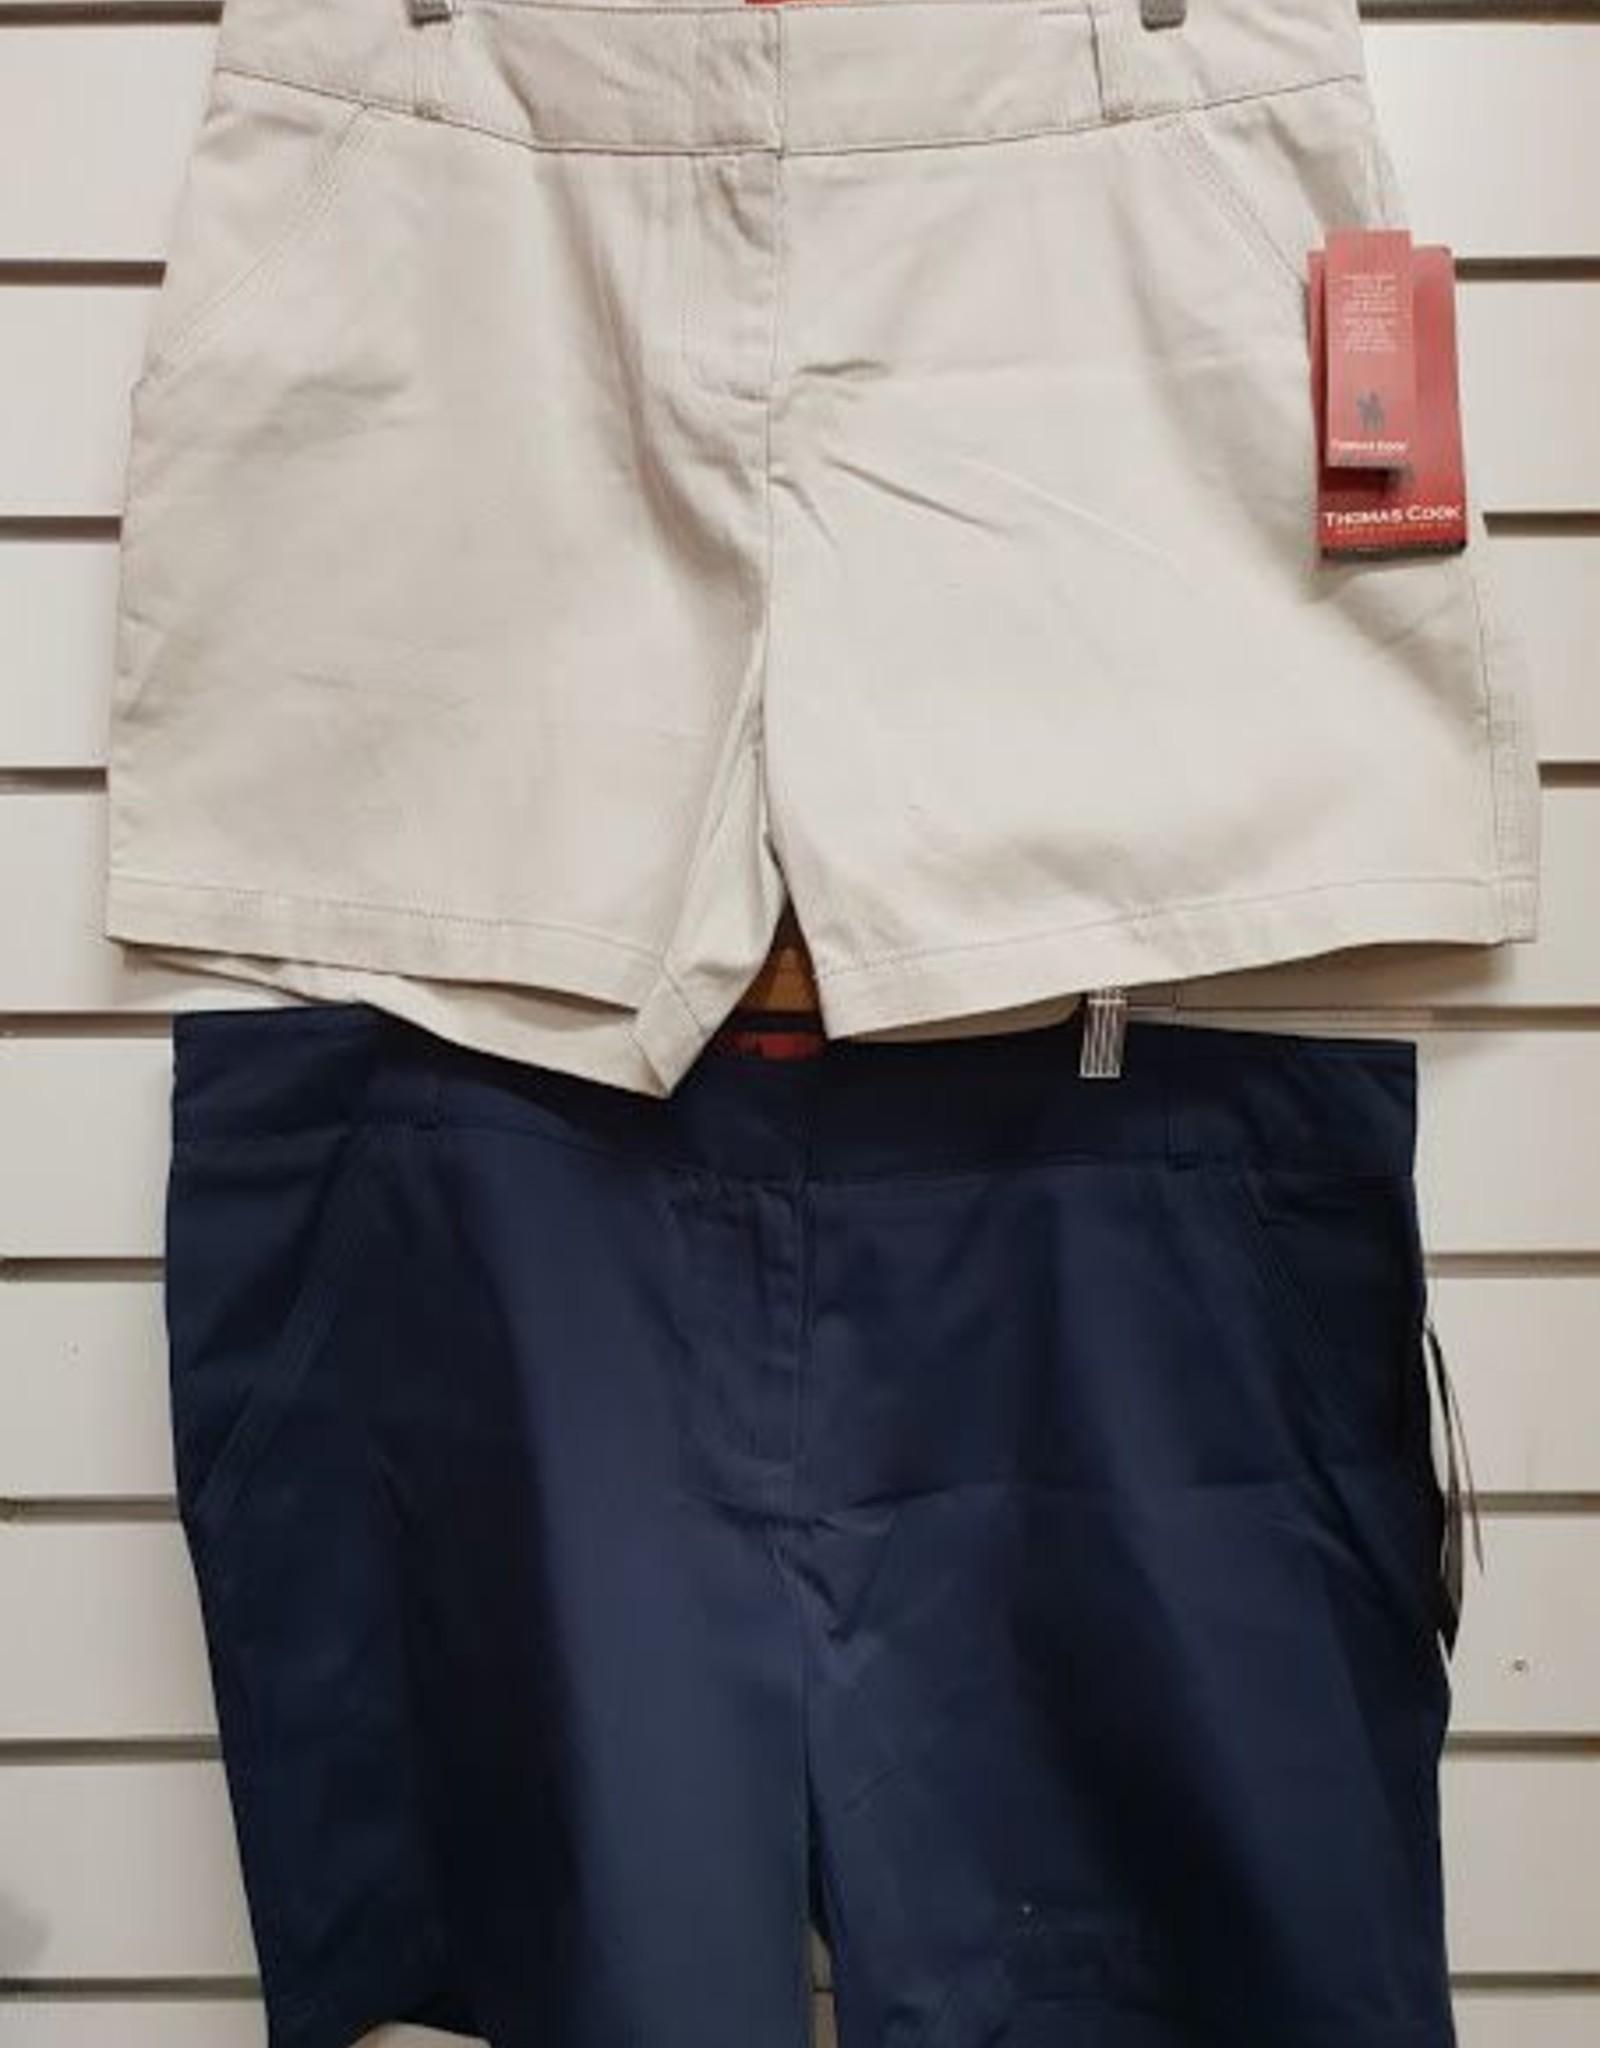 Thomas Cook Thomas Cook Slant Pocket Shorts